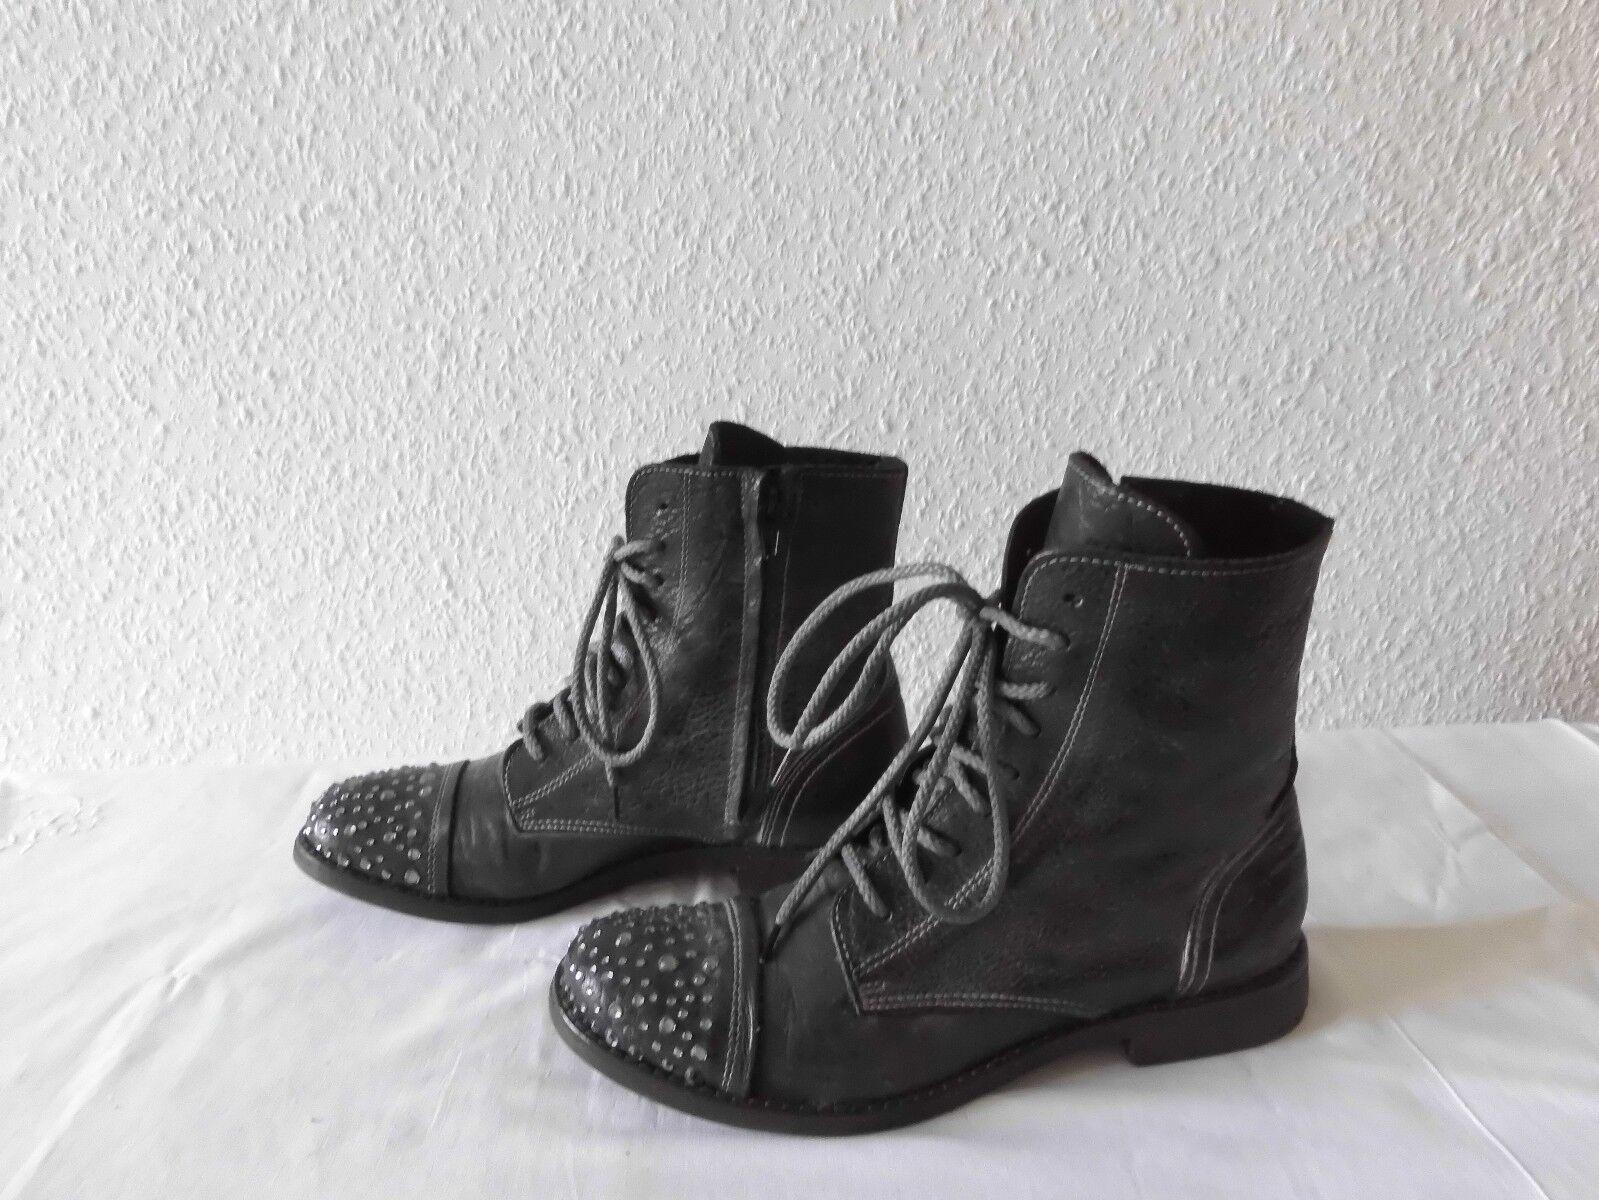 Luxus- Stiefeletten Stiefel  I Gr.39 LOVE BIONDINI Schuhe  Gr.39 I  Leder   TOP f506fa